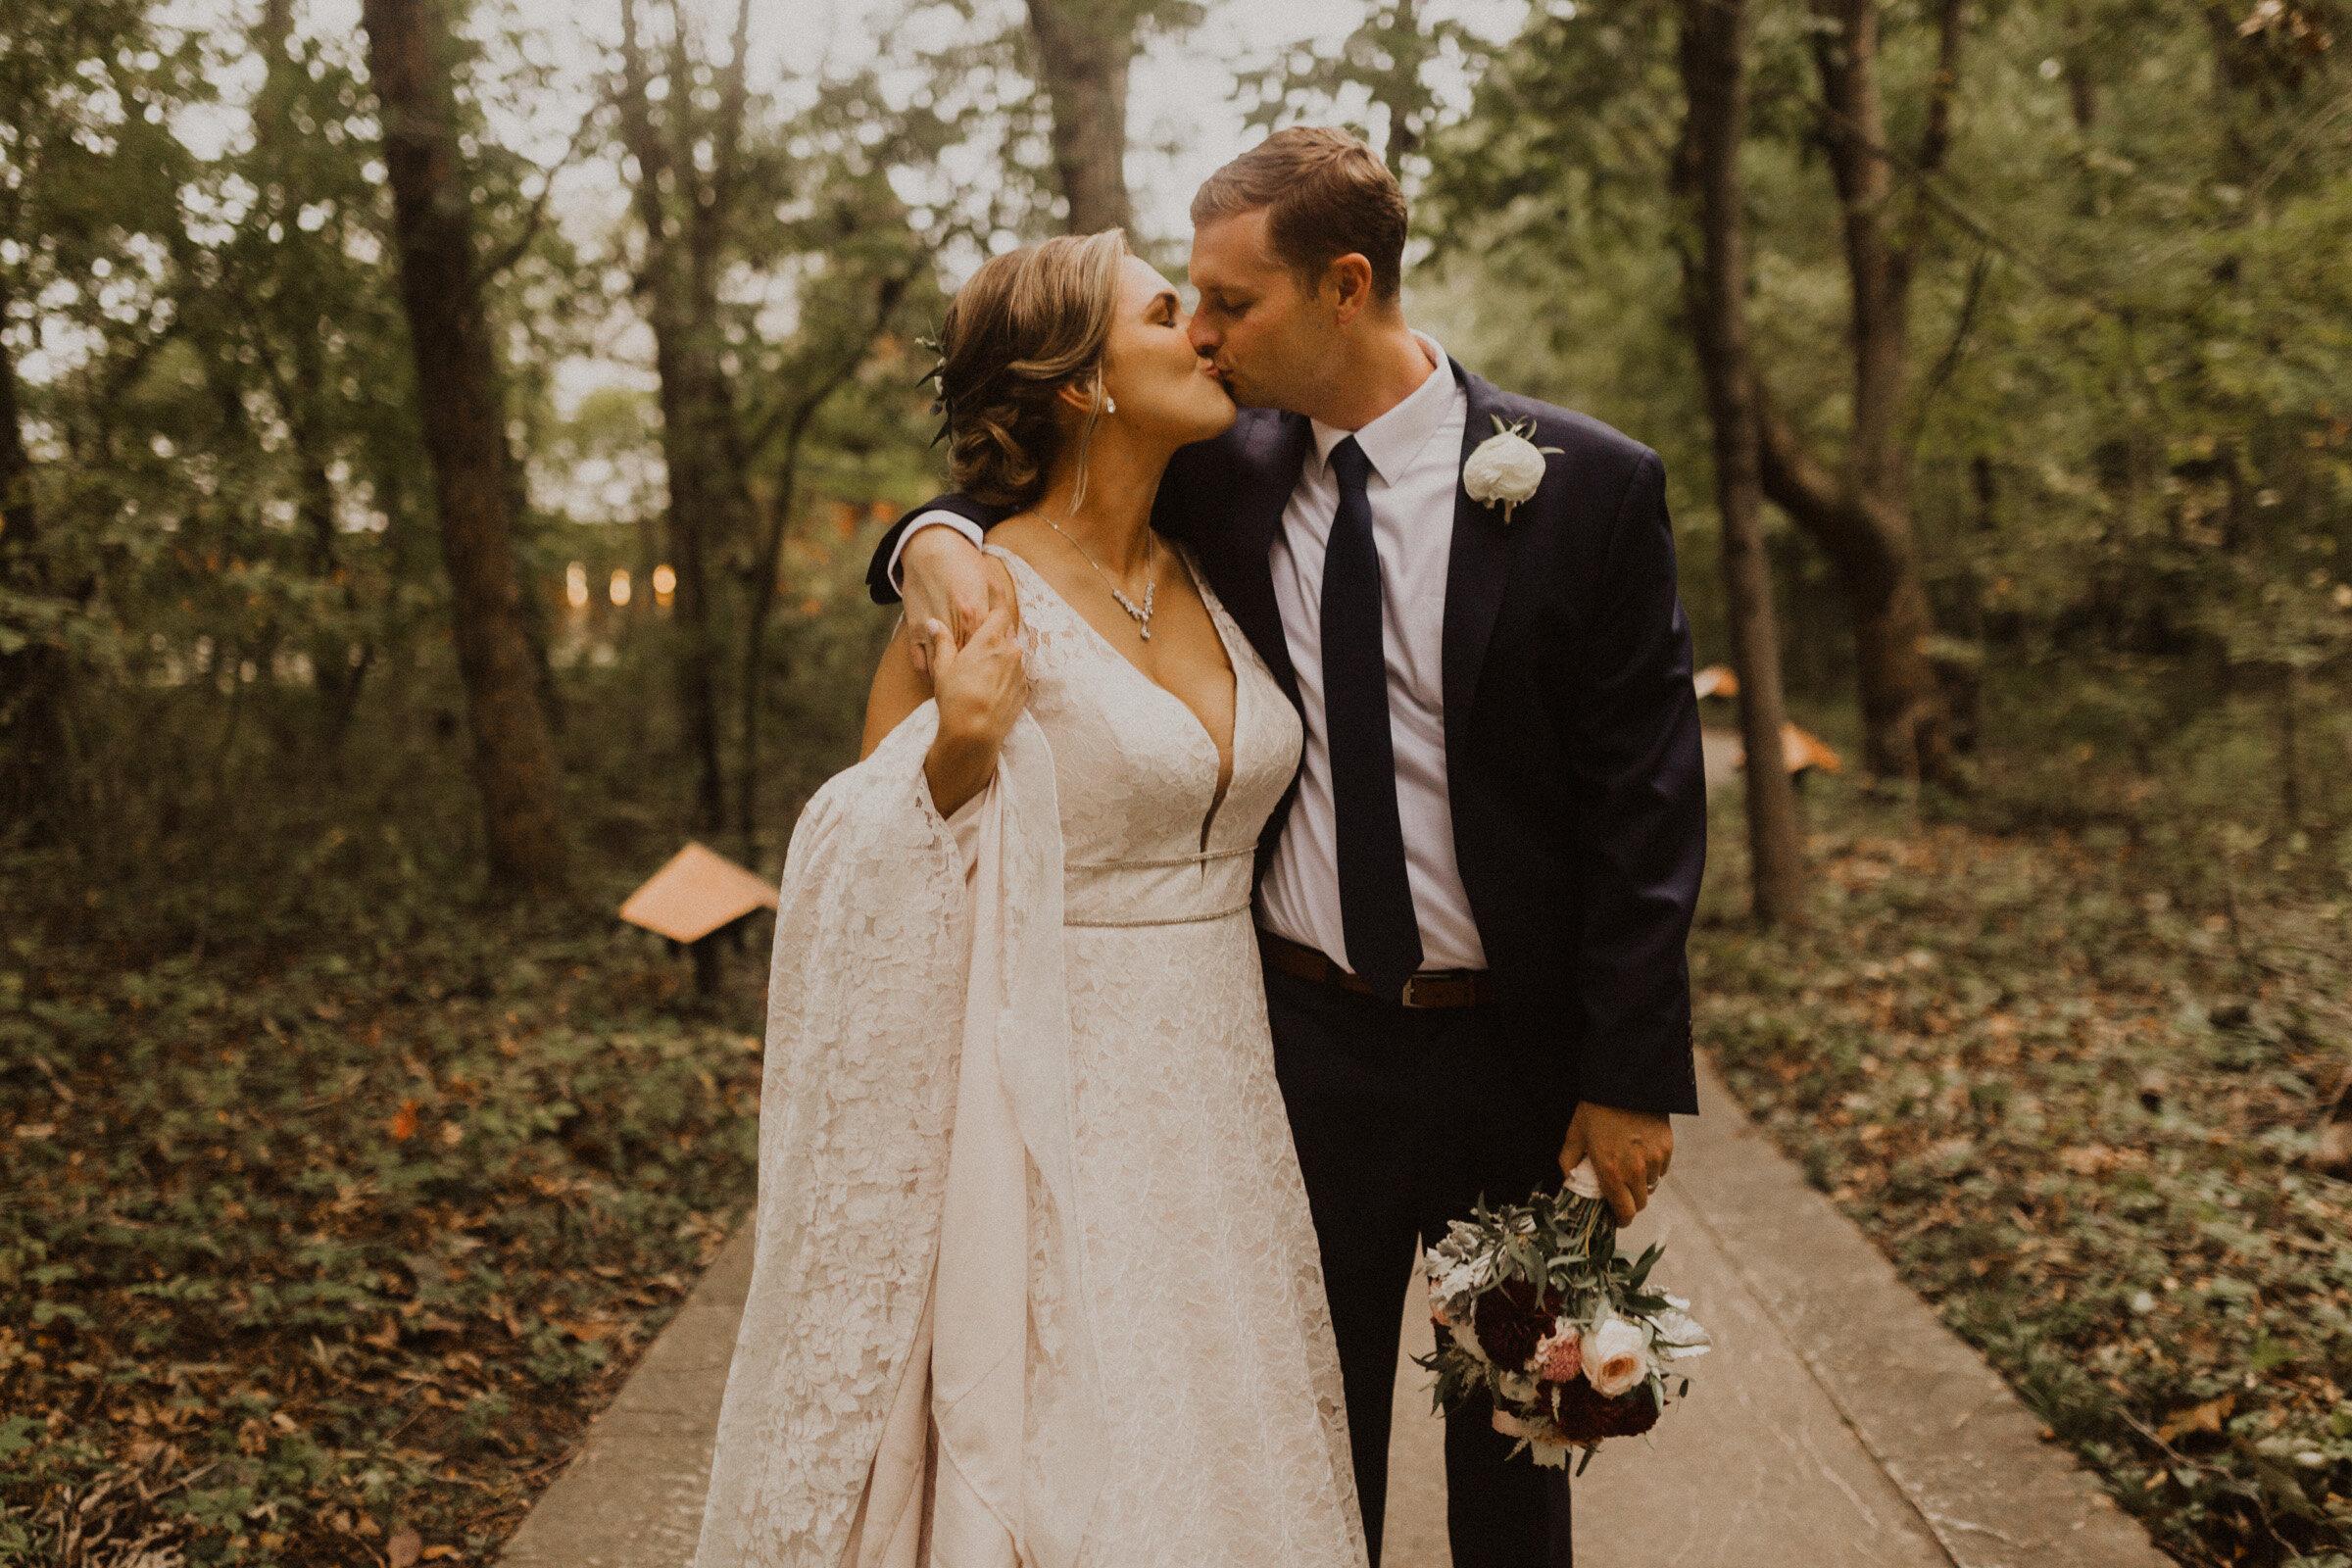 alyssa barletter photography summer wedding photographer powell gardens-25.jpg